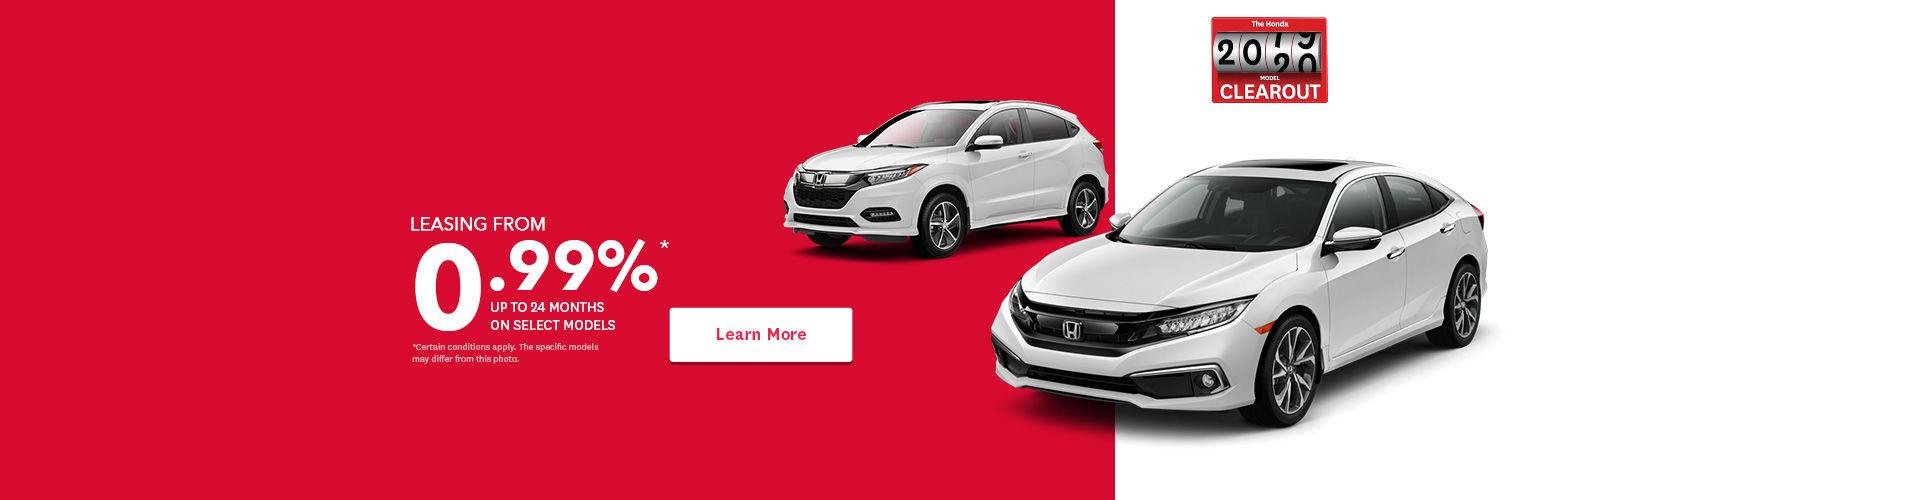 Honda event - header